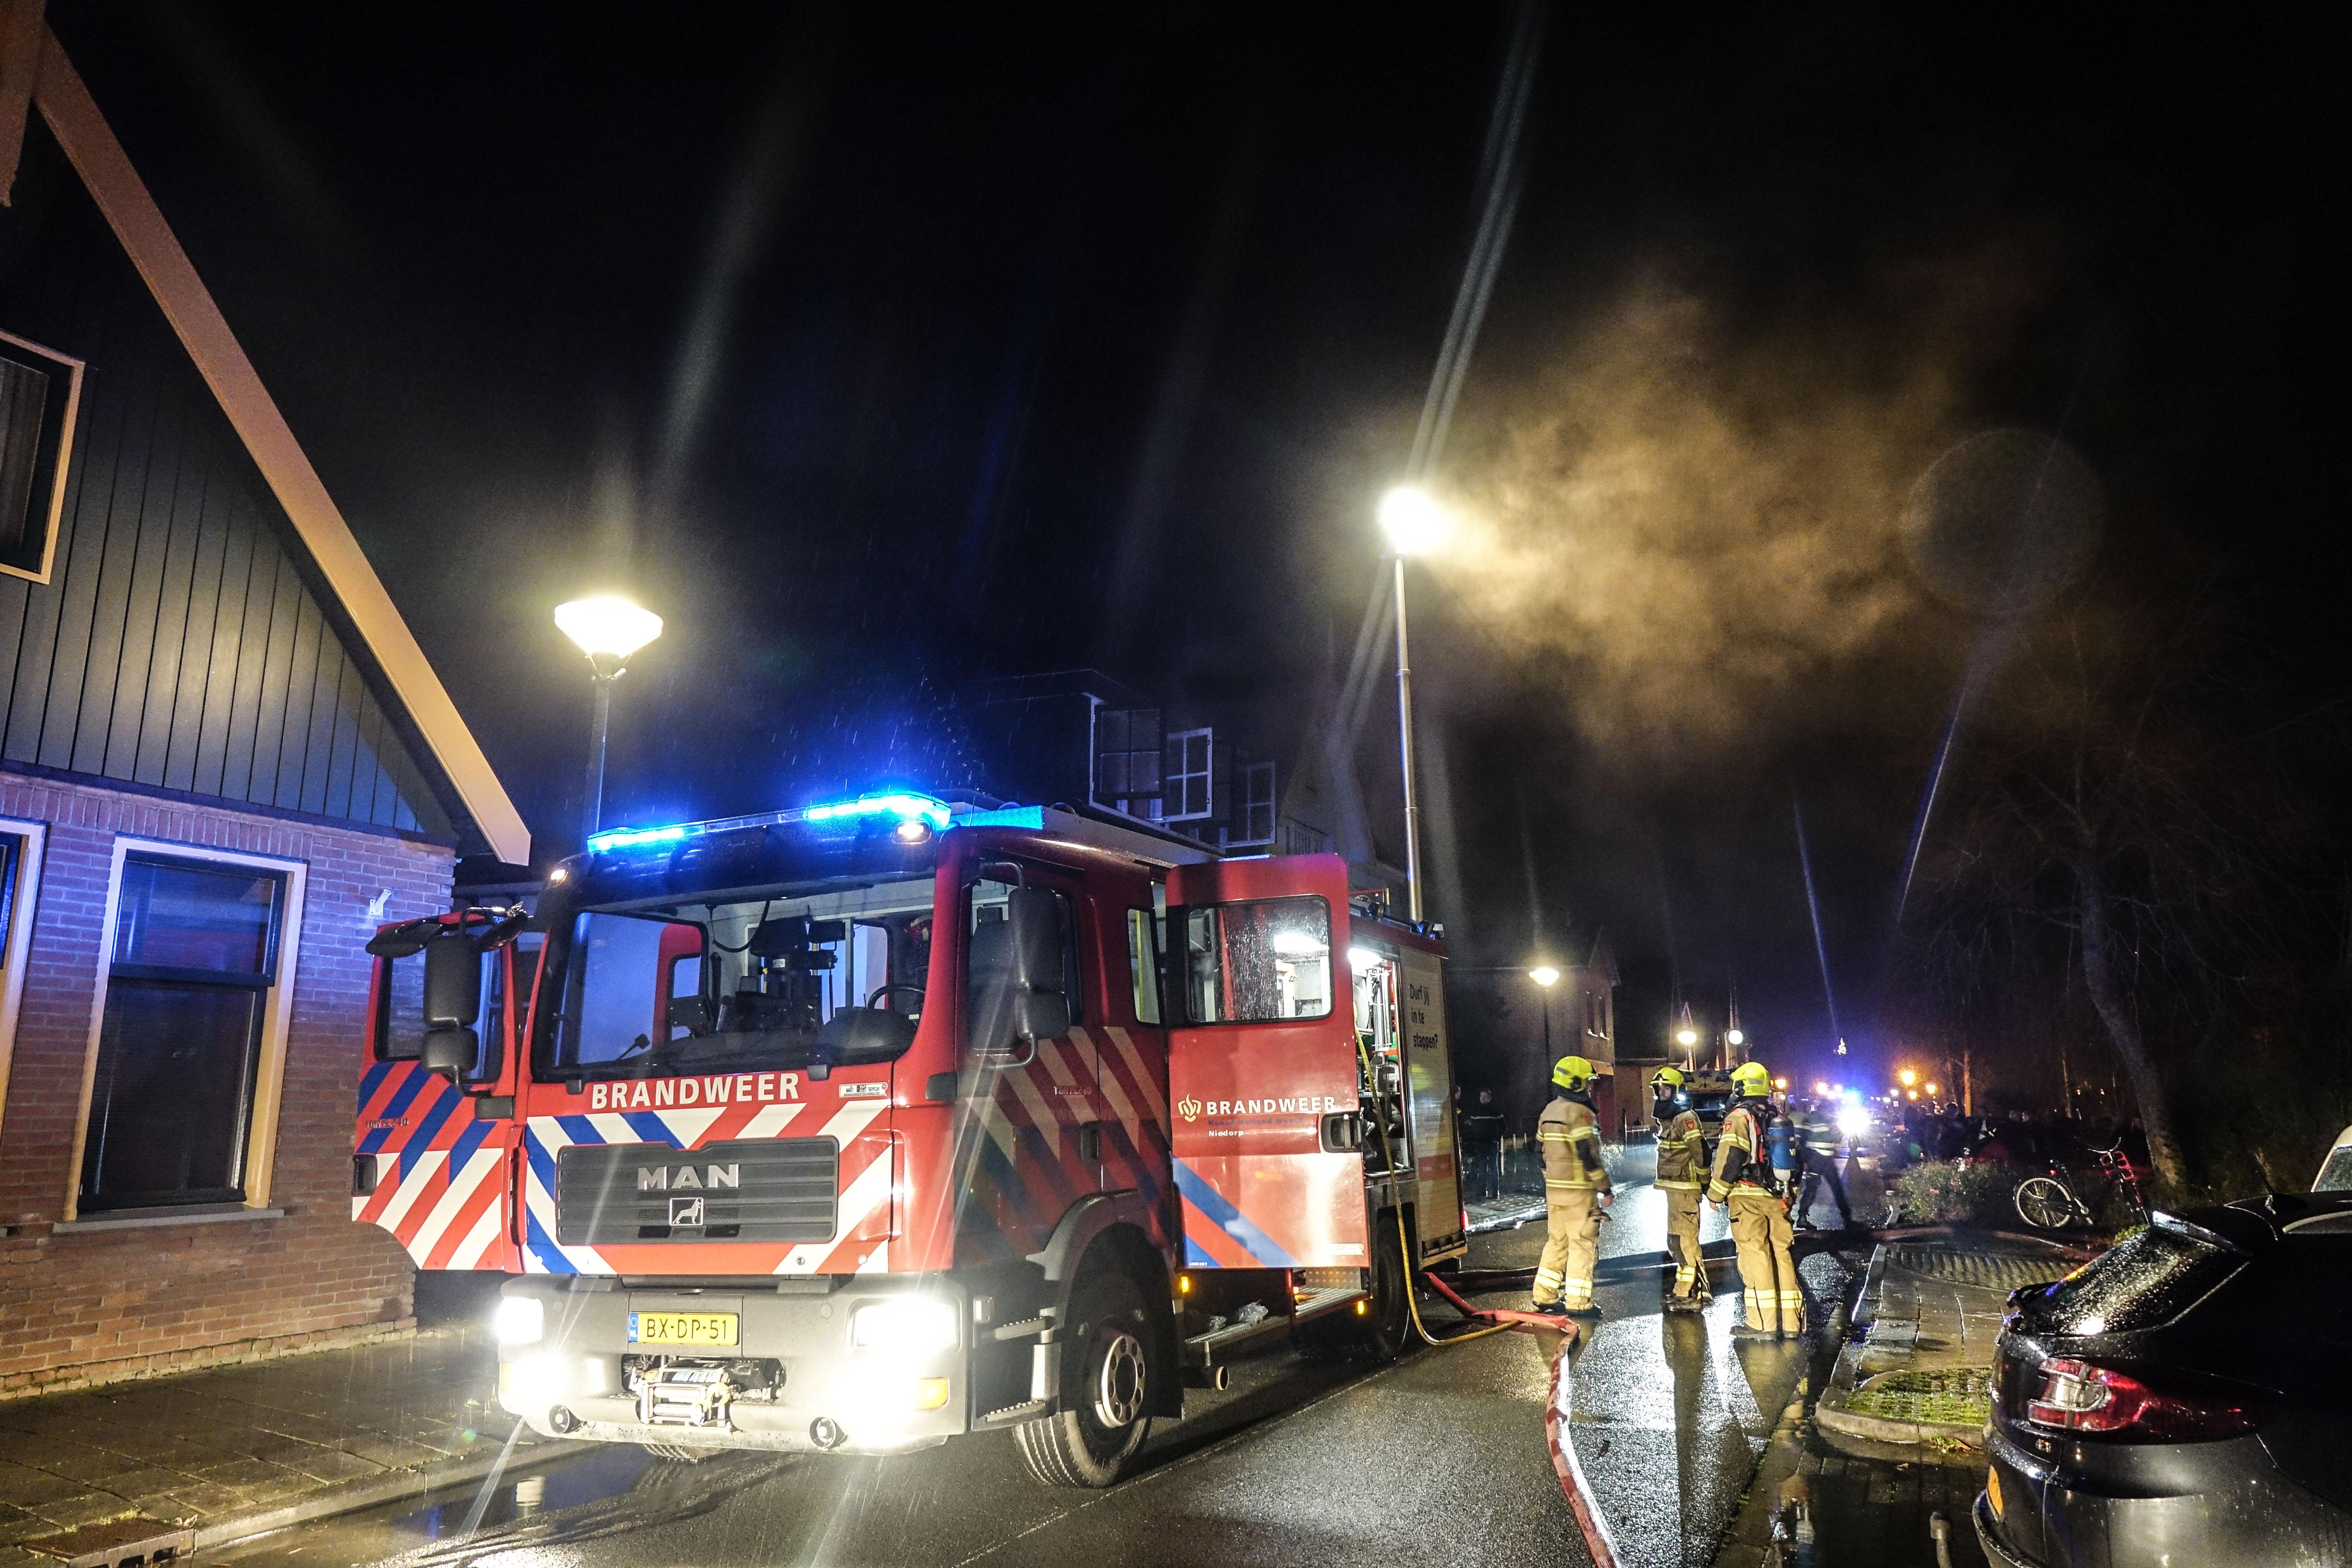 Gewonde bij woningbrand in Winkel na sprong uit raam